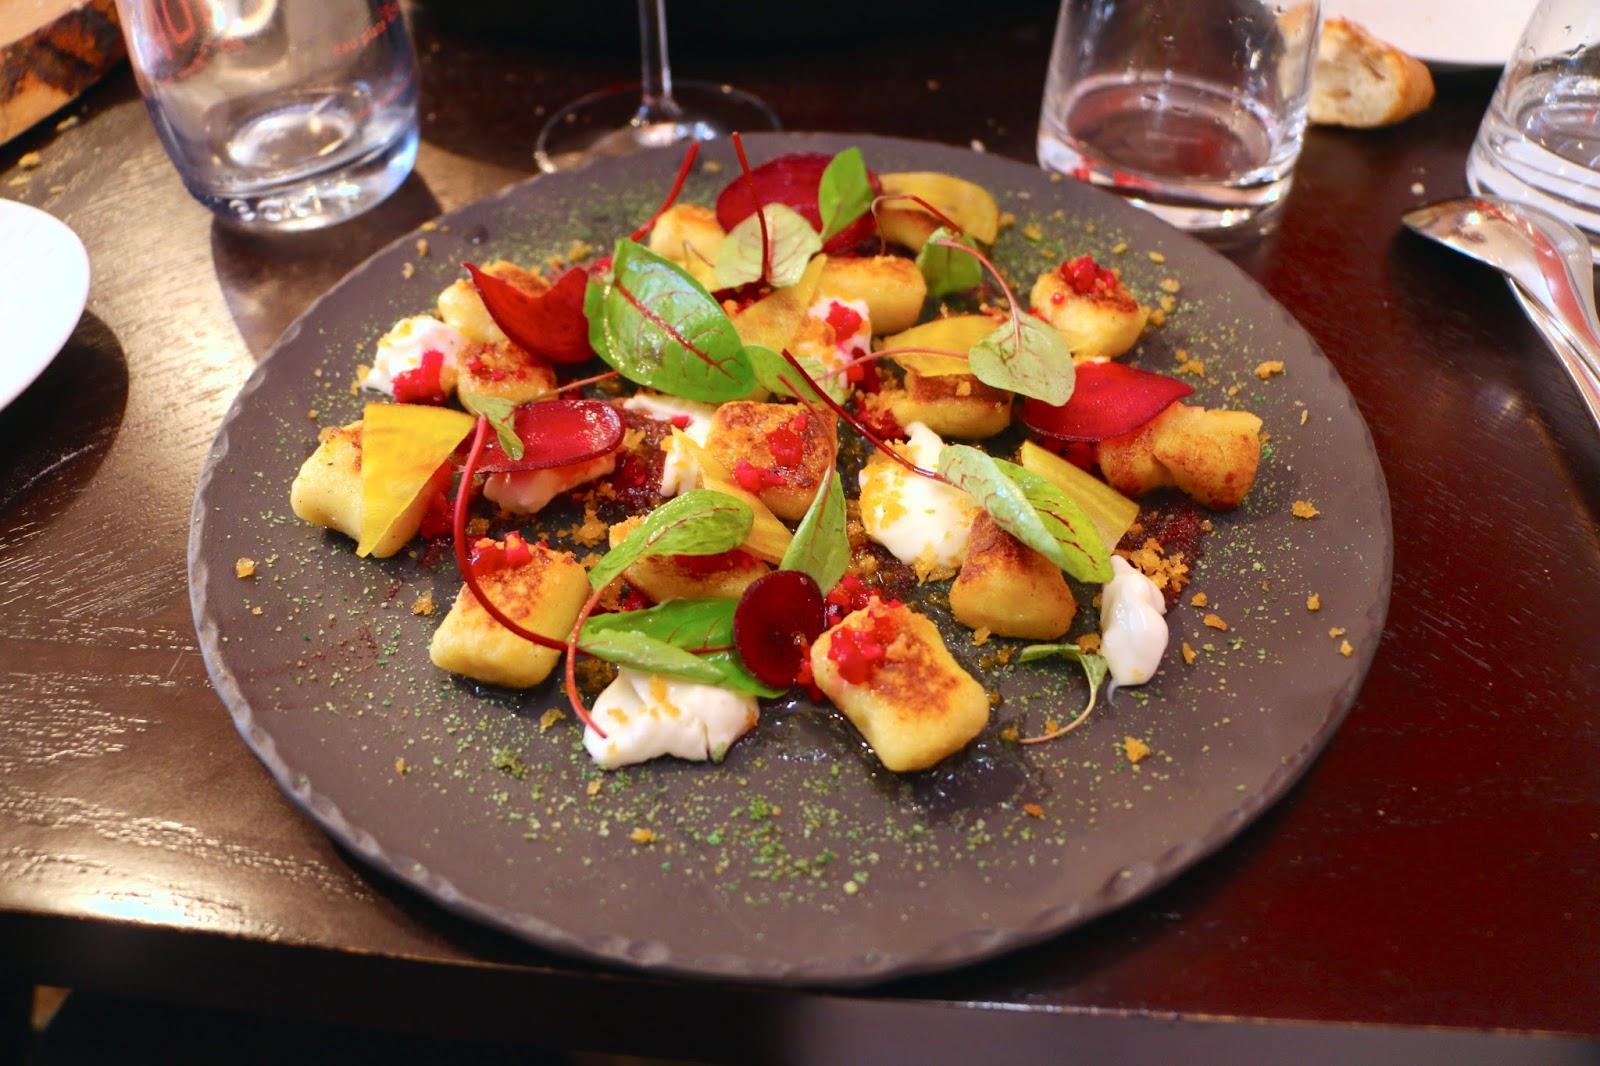 Ida cuisine italienne 15e arrondissement paris ci l for Cuisine italienne